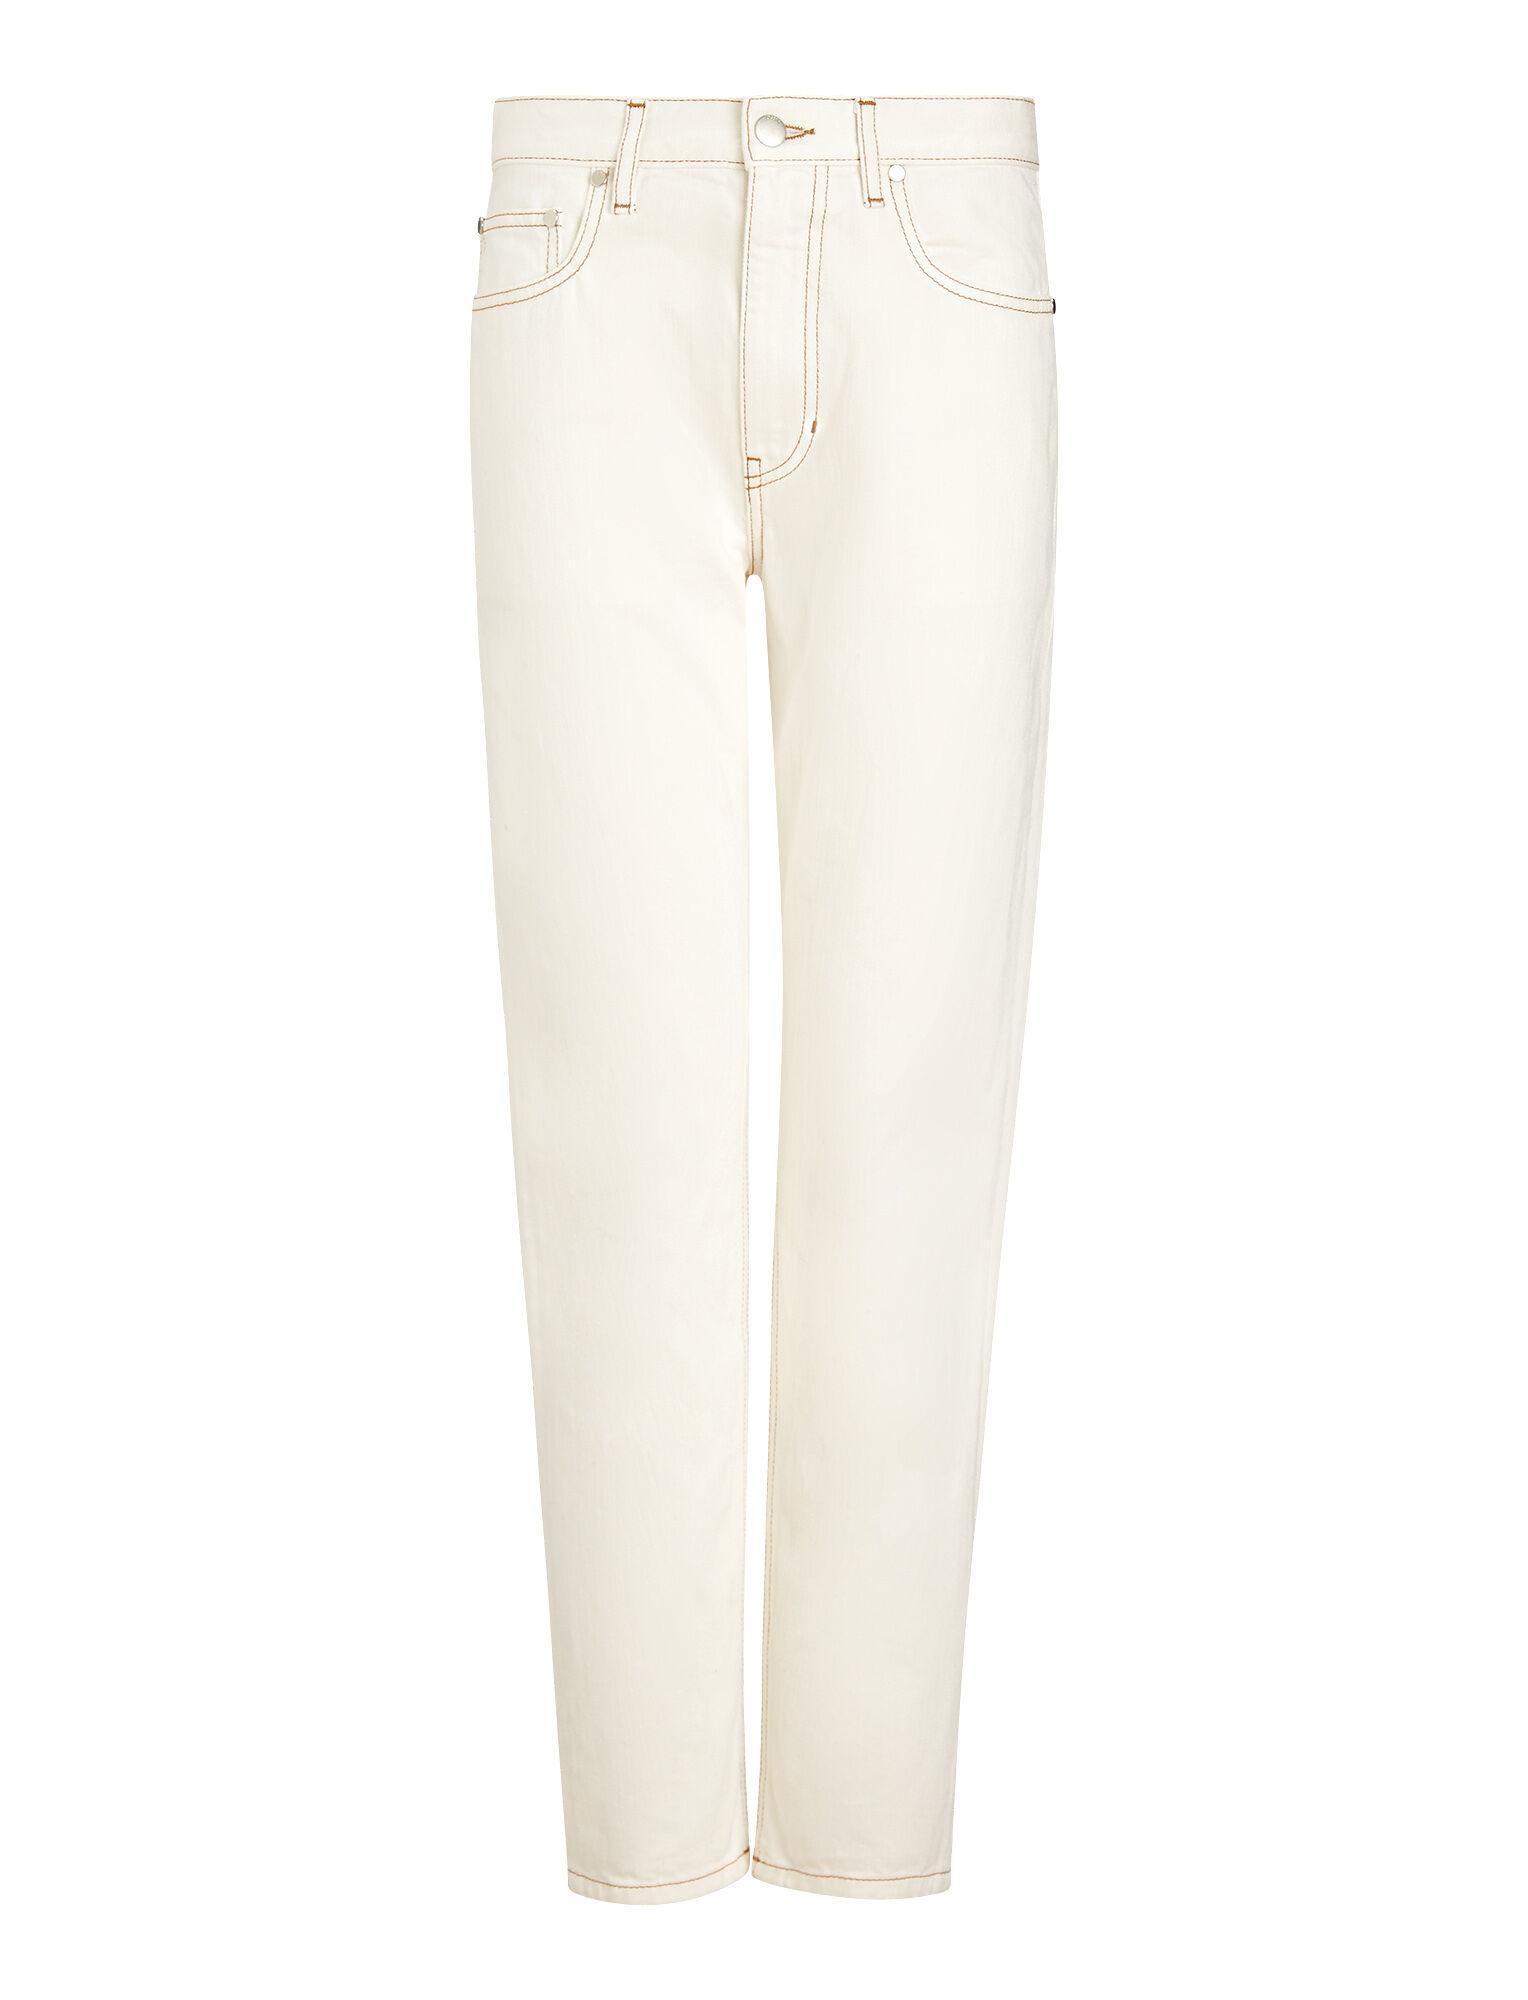 Demin En Kemp Kemp Pantalon Kemp En Pantalon Demin Blanc En Blanc Demin Pantalon mNwOvnPy80